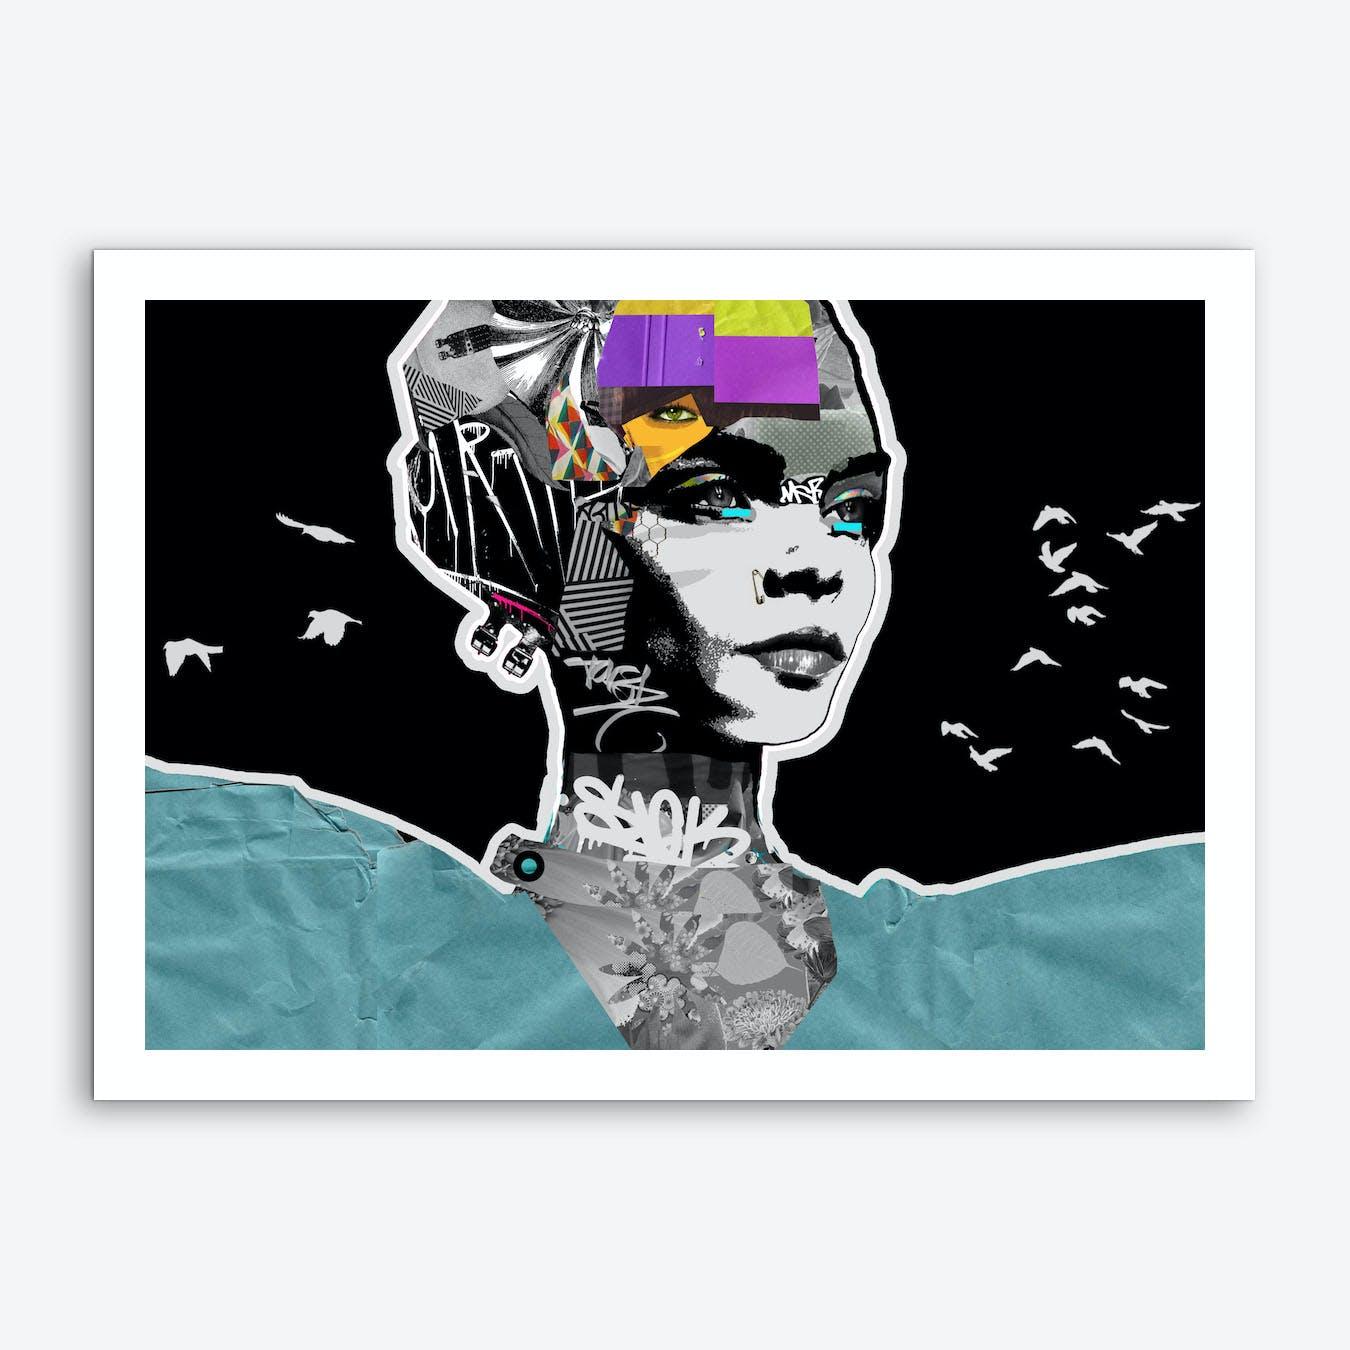 Snob 2 Art Print